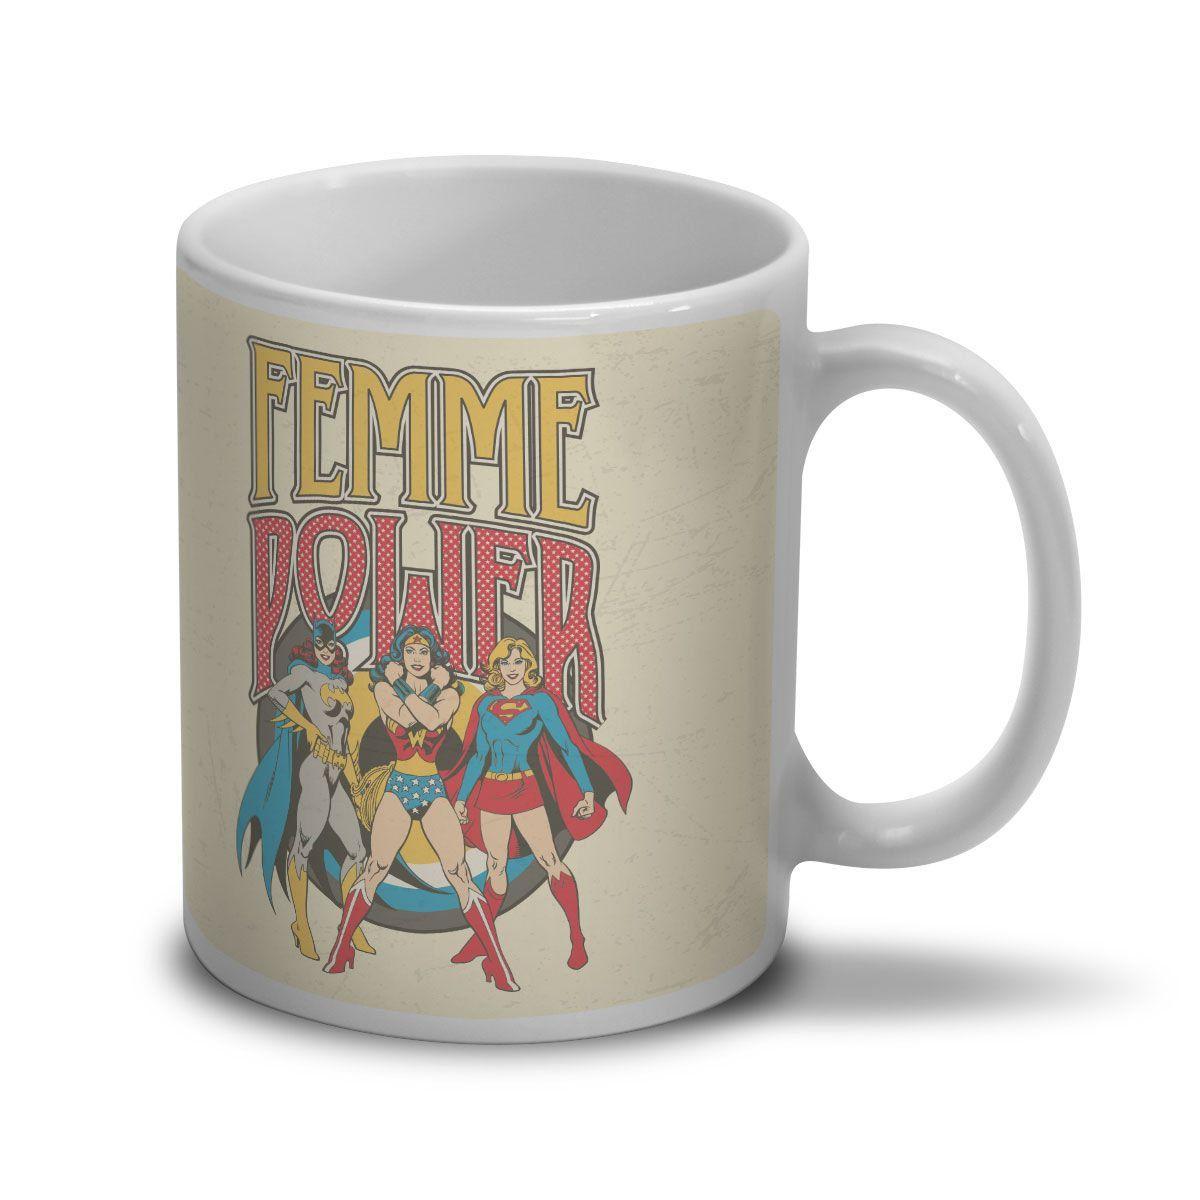 Caneca Power Girls Femme Power  - bandUP Store Marketplace